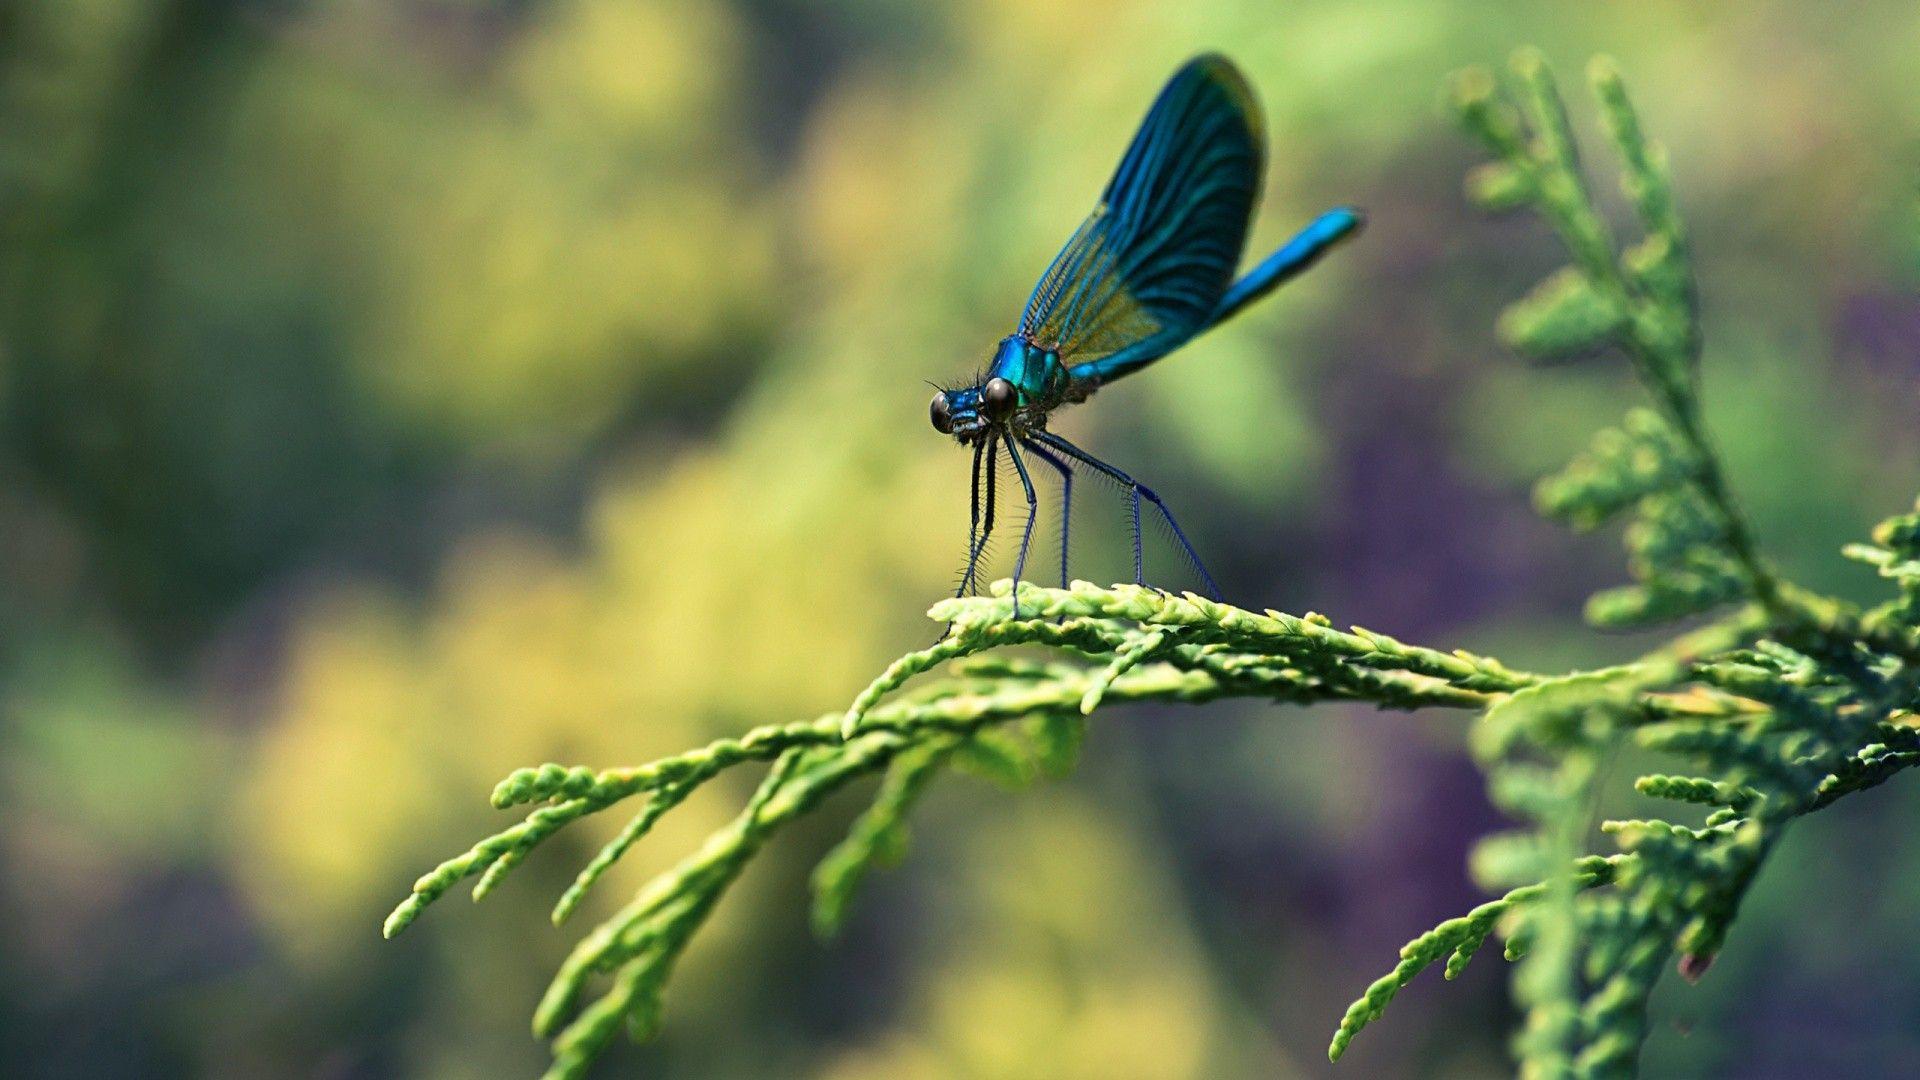 macro wallpaper | blue dragonfly macro wallpaper - new hd